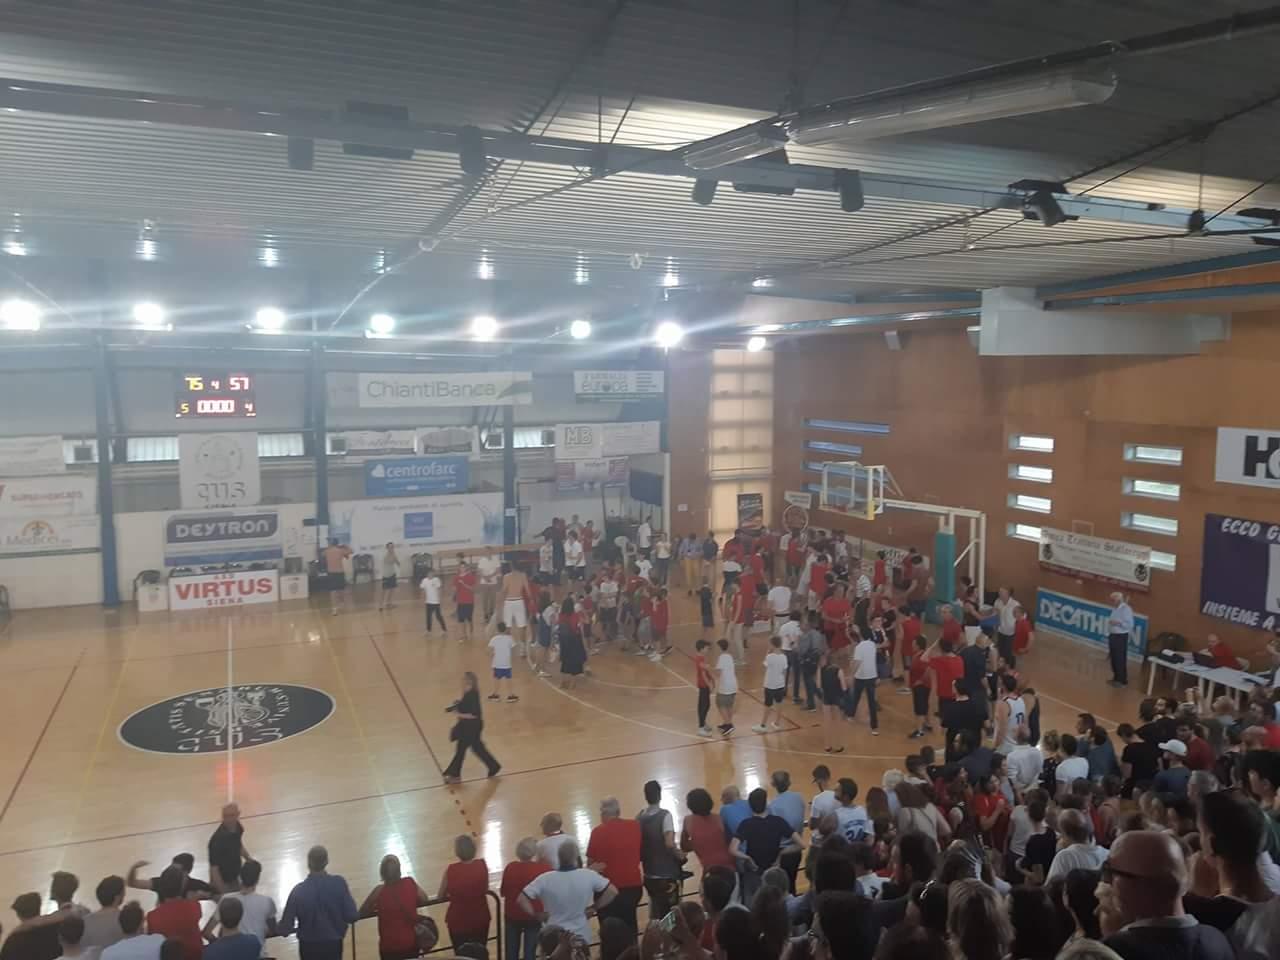 La Virtus Siena vola in B: battuta Livorno in gara5